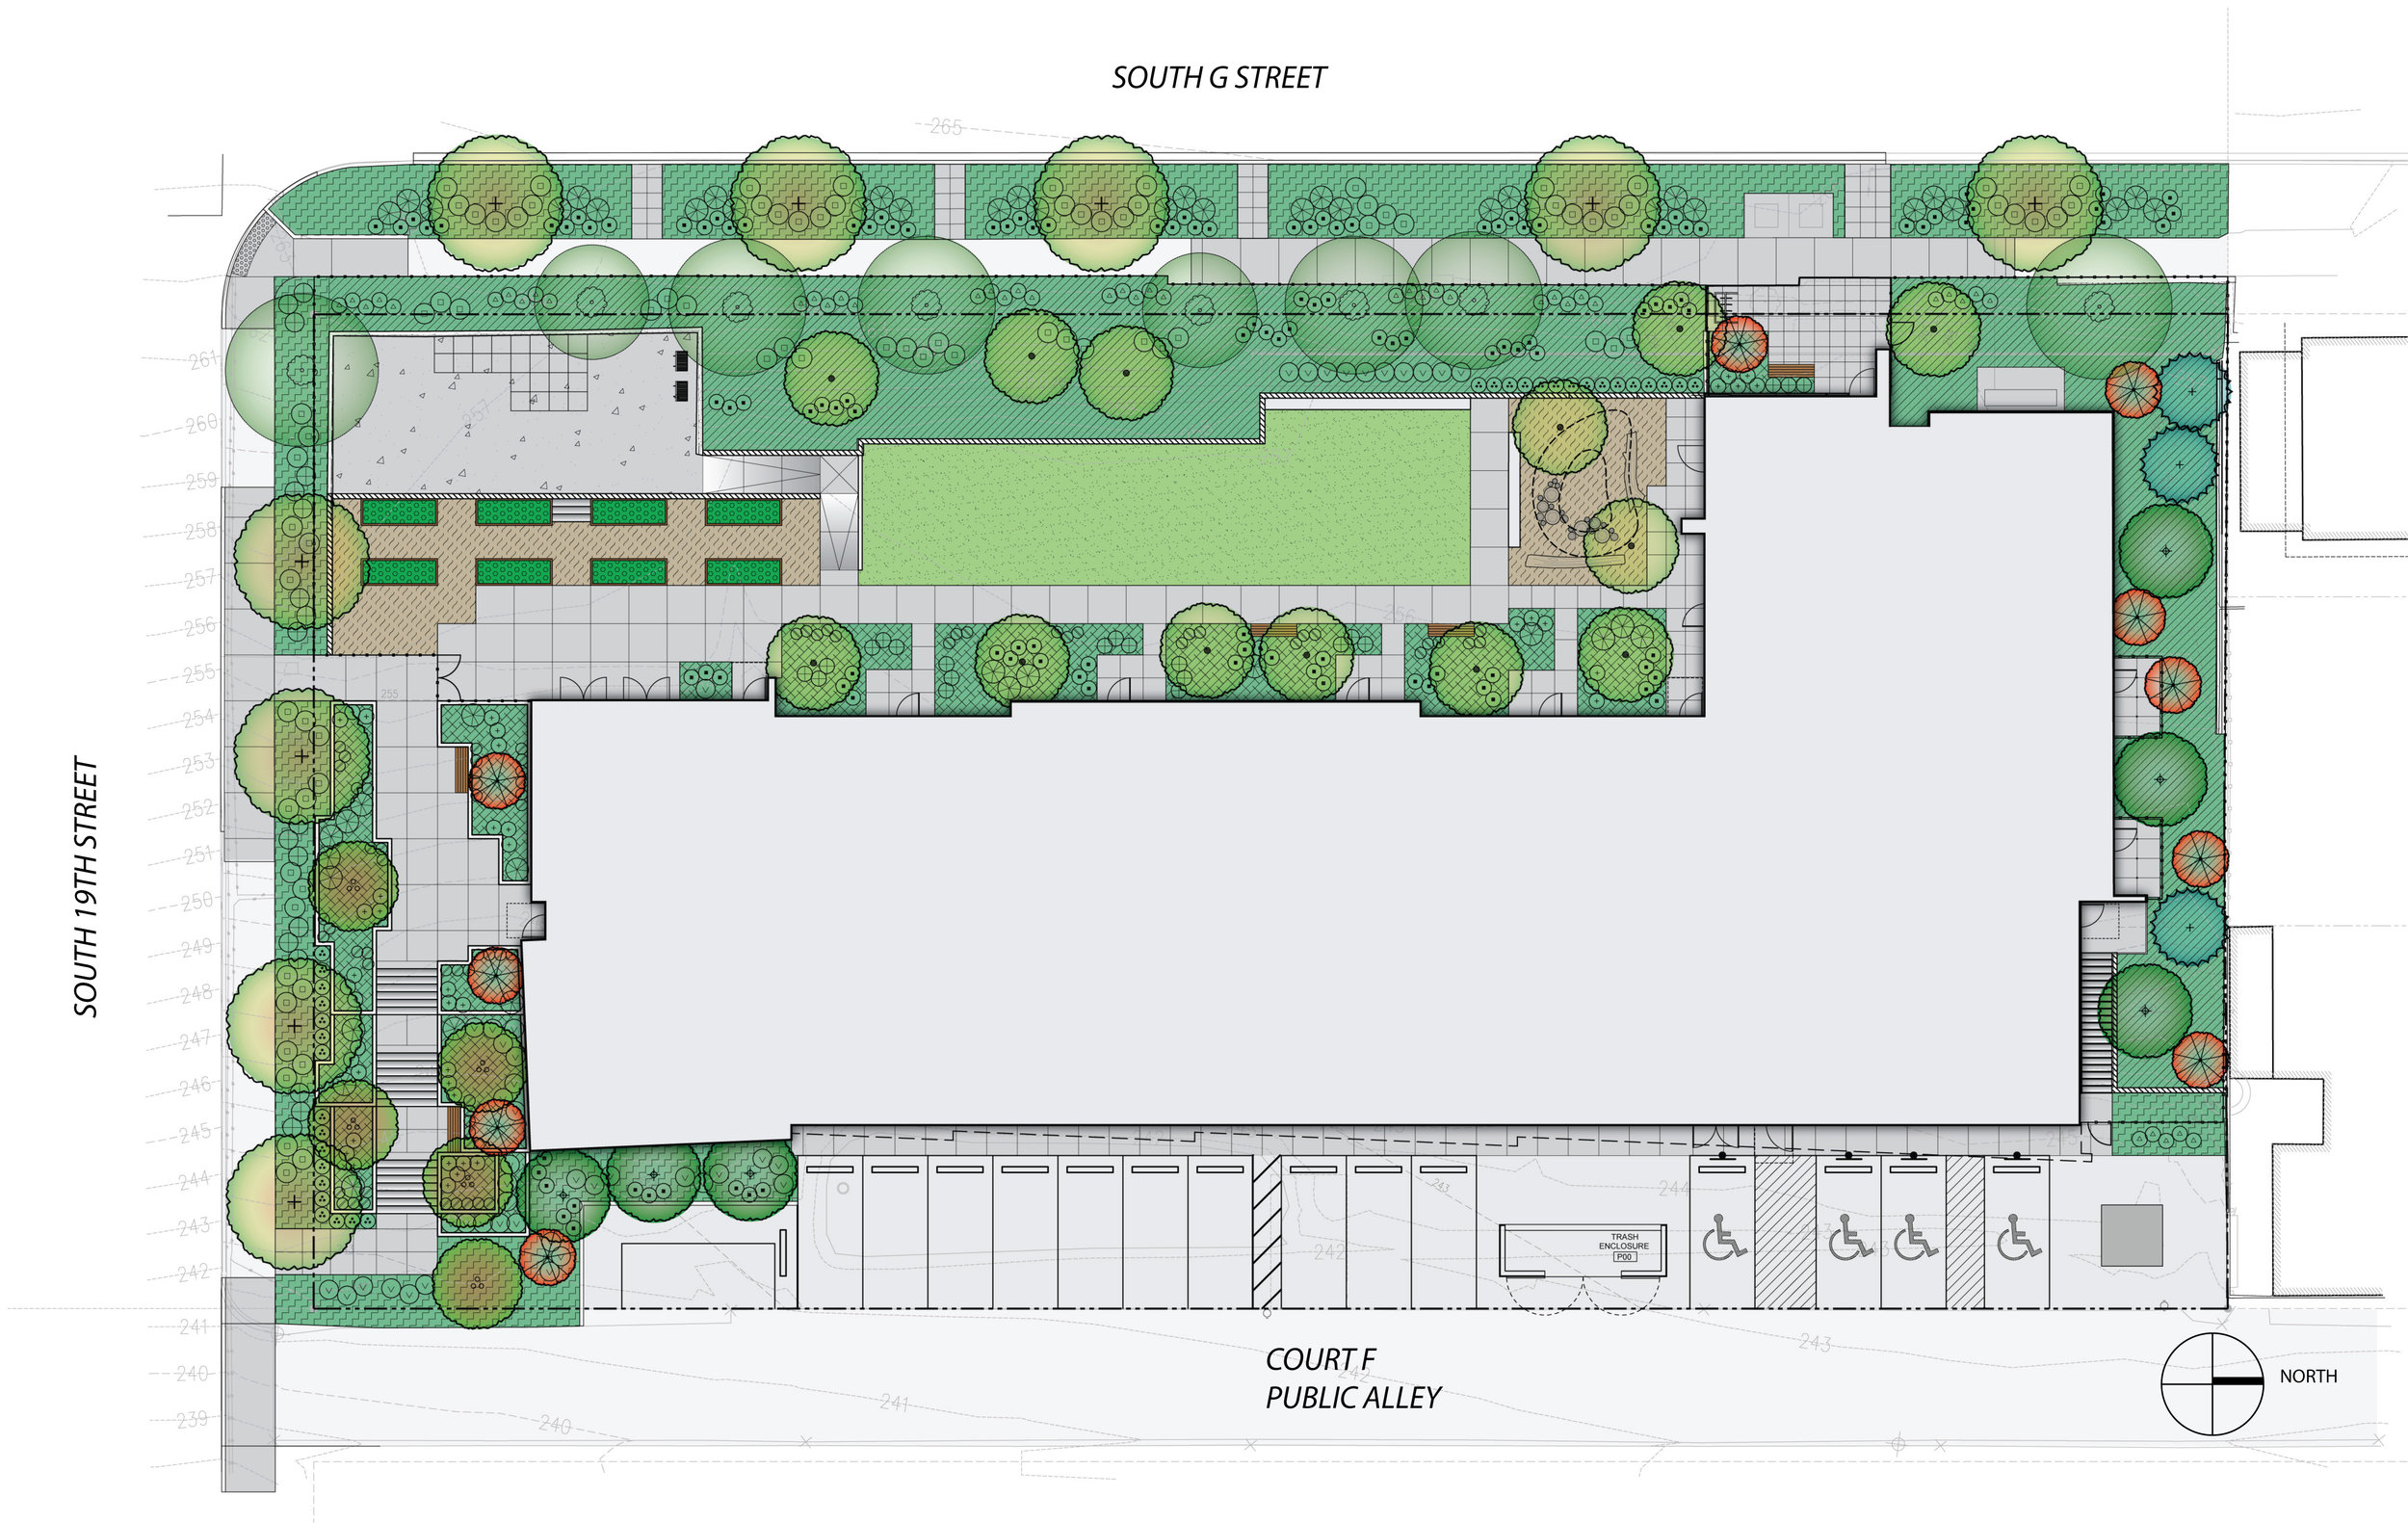 Hillside Terrace_rendered plan with labels.jpg